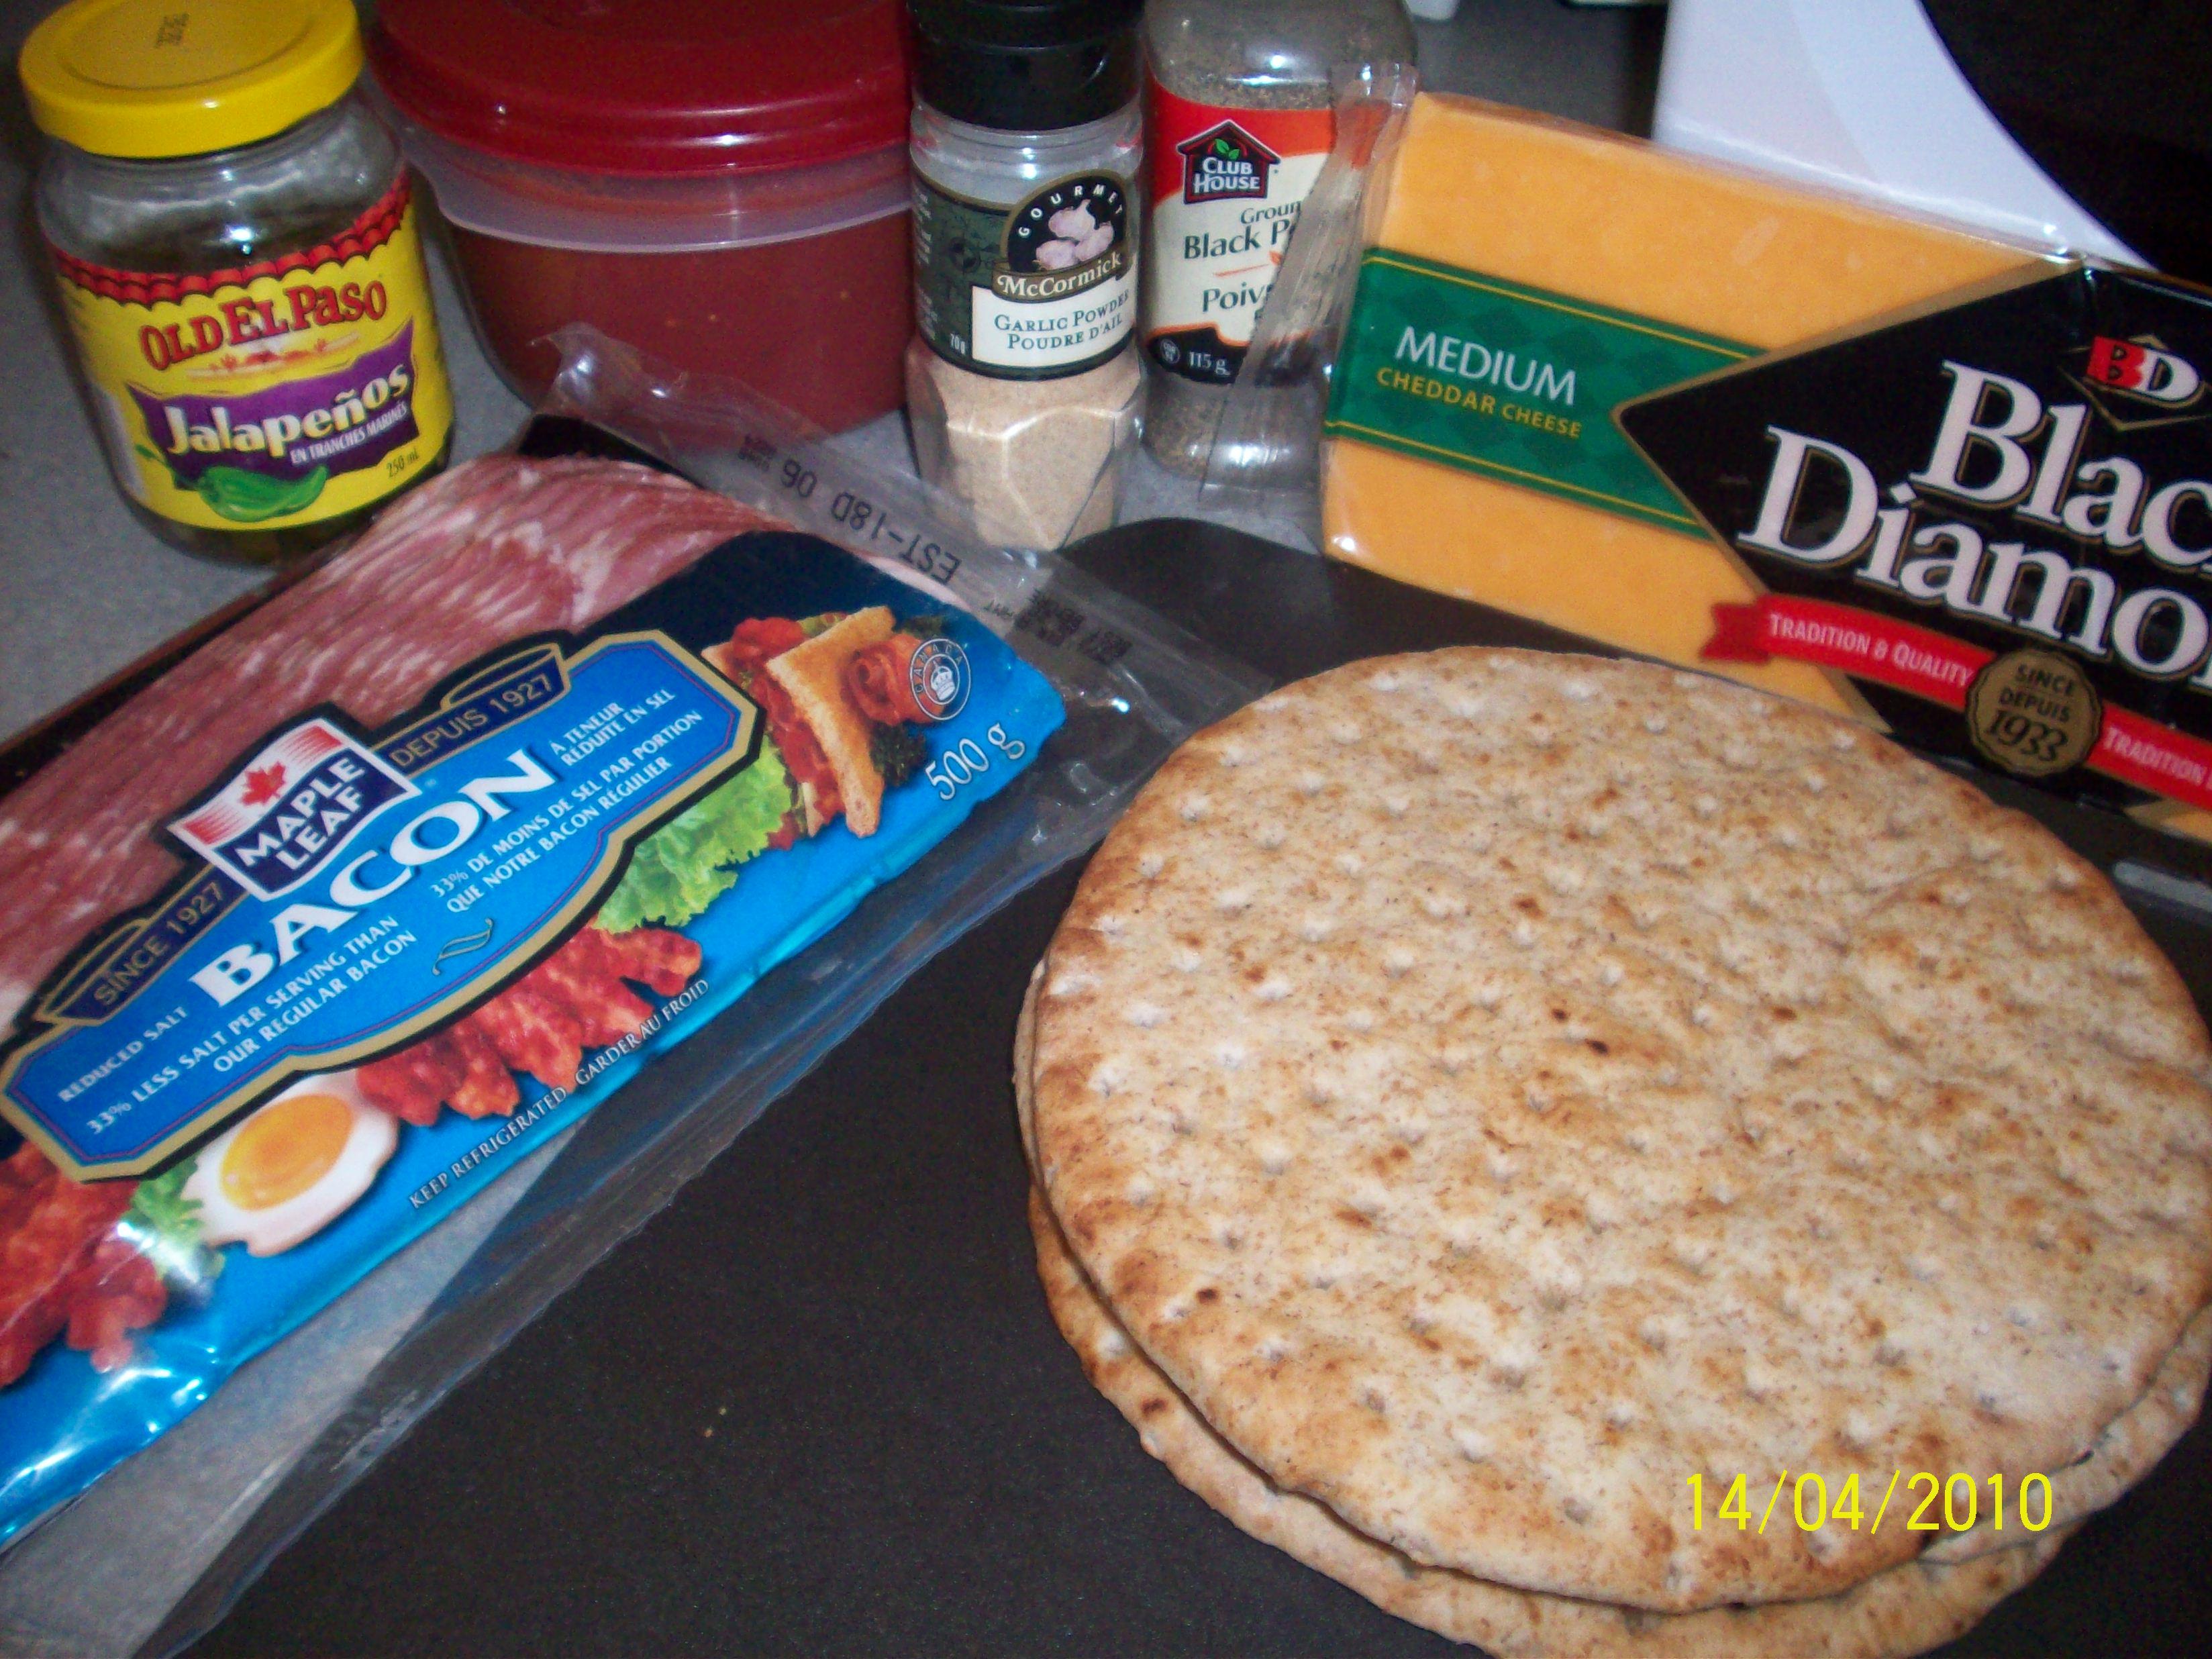 http://foodloader.net/cutie_2010-04-14_Pita_Pizza1.jpg